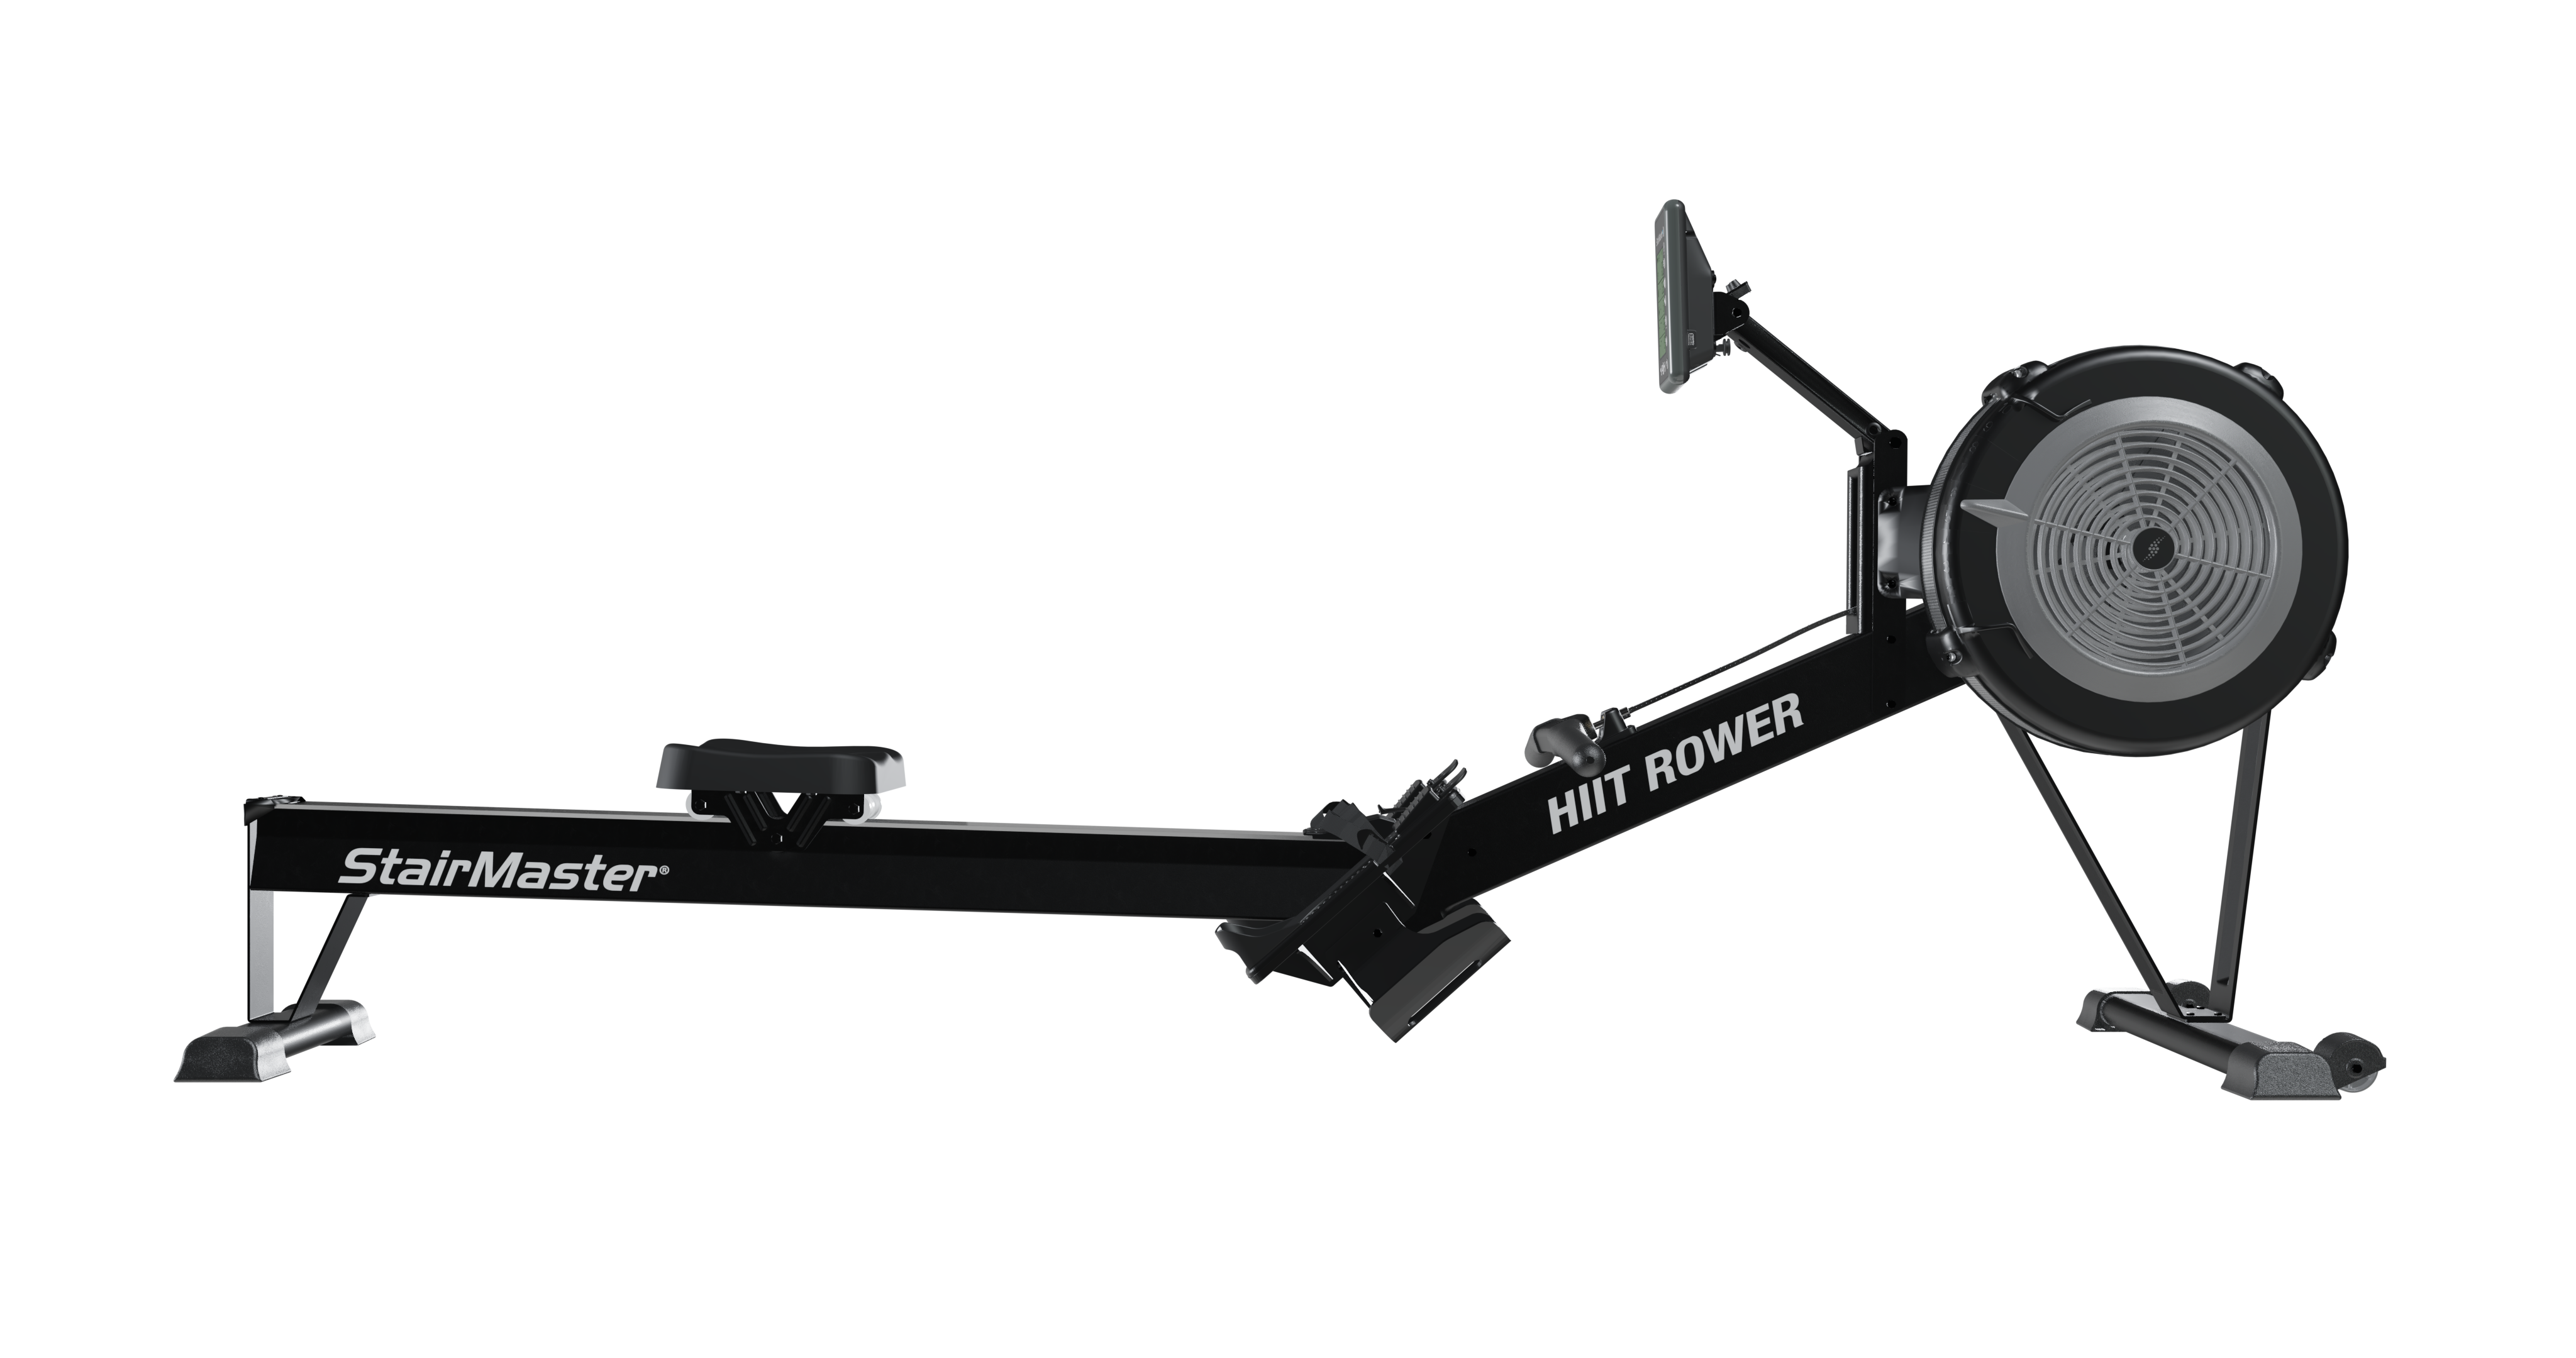 Image - StairMaster - HIIT Rower 2